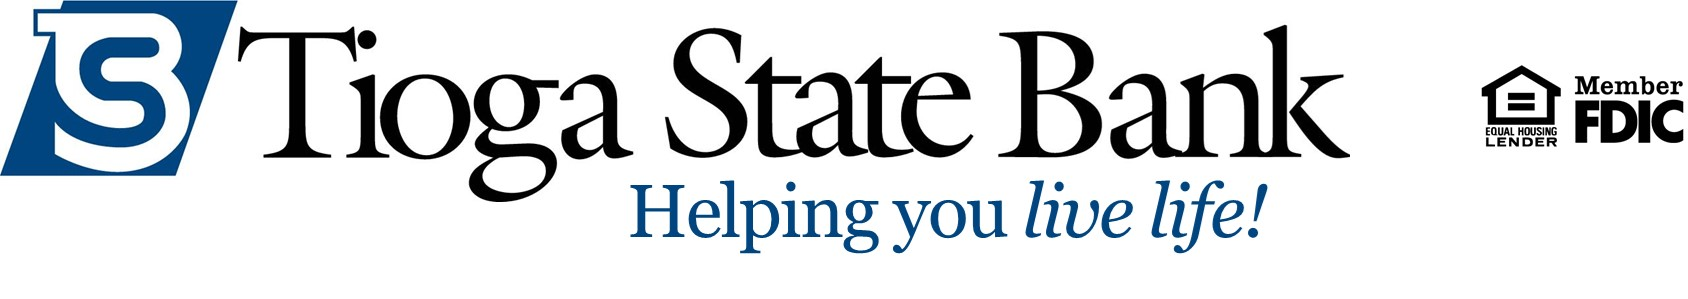 TSB logo helping you live life EHL FDIC